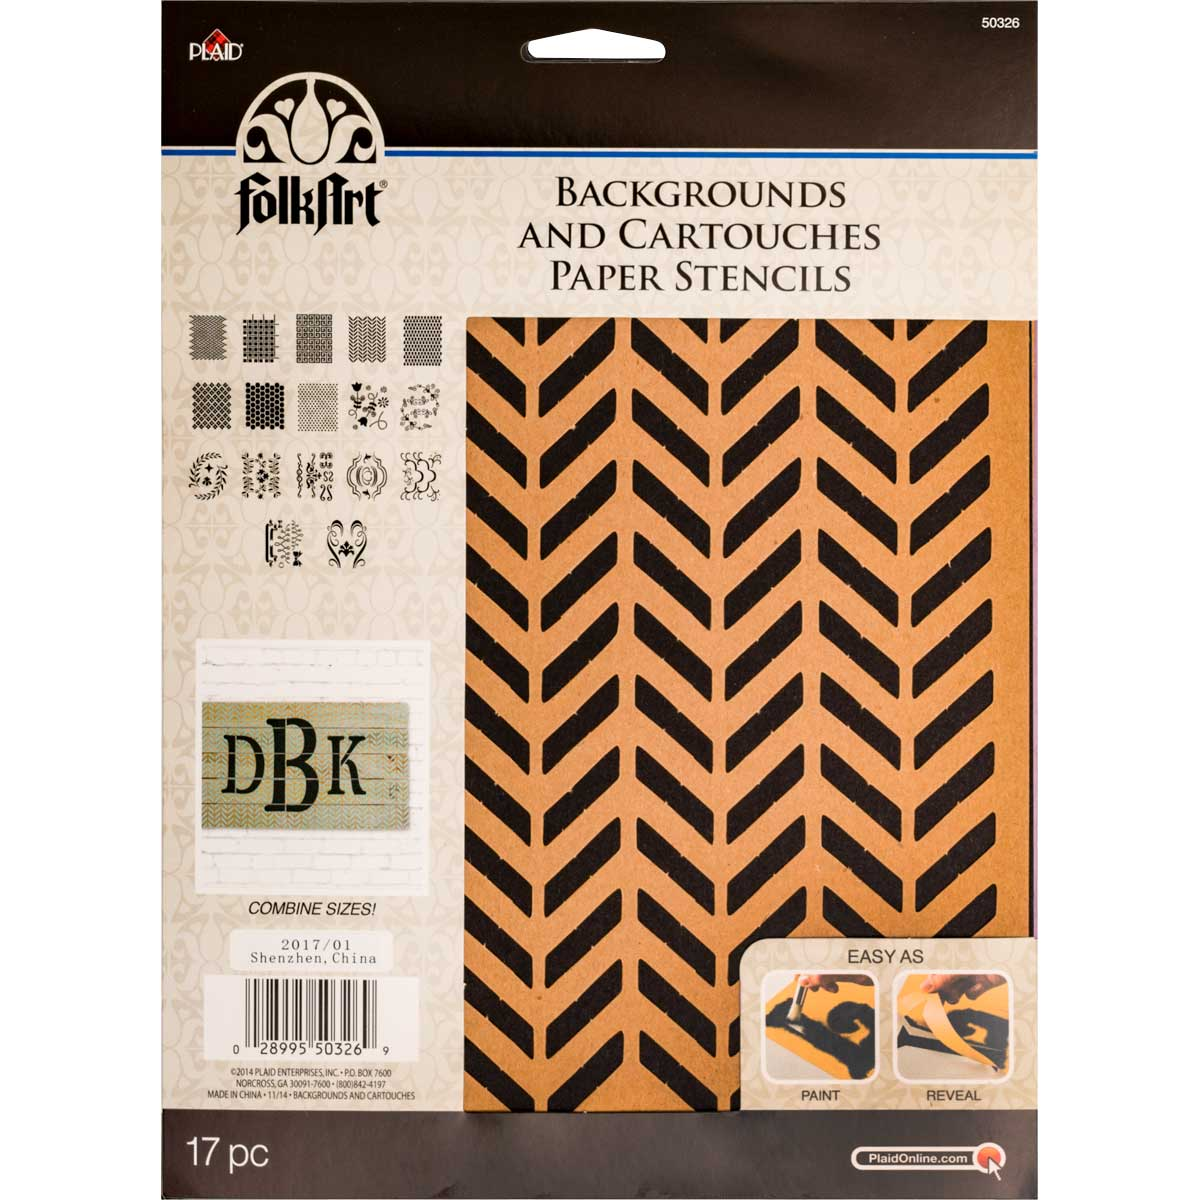 FolkArt ® Alphabet & Monogram Paper Stencils - Backgrounds and Cartouches - 50326